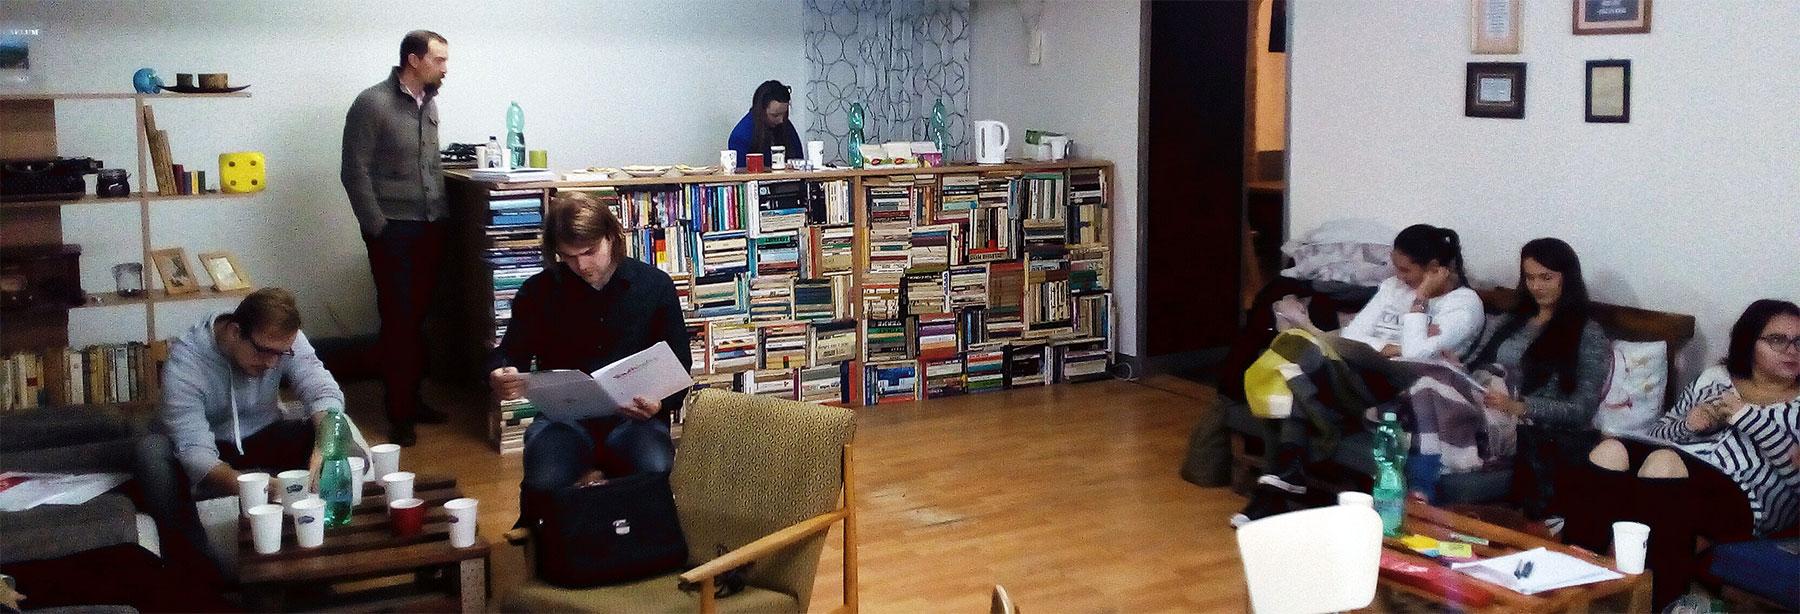 YouthMetre Study Group Trnava, Slovakia